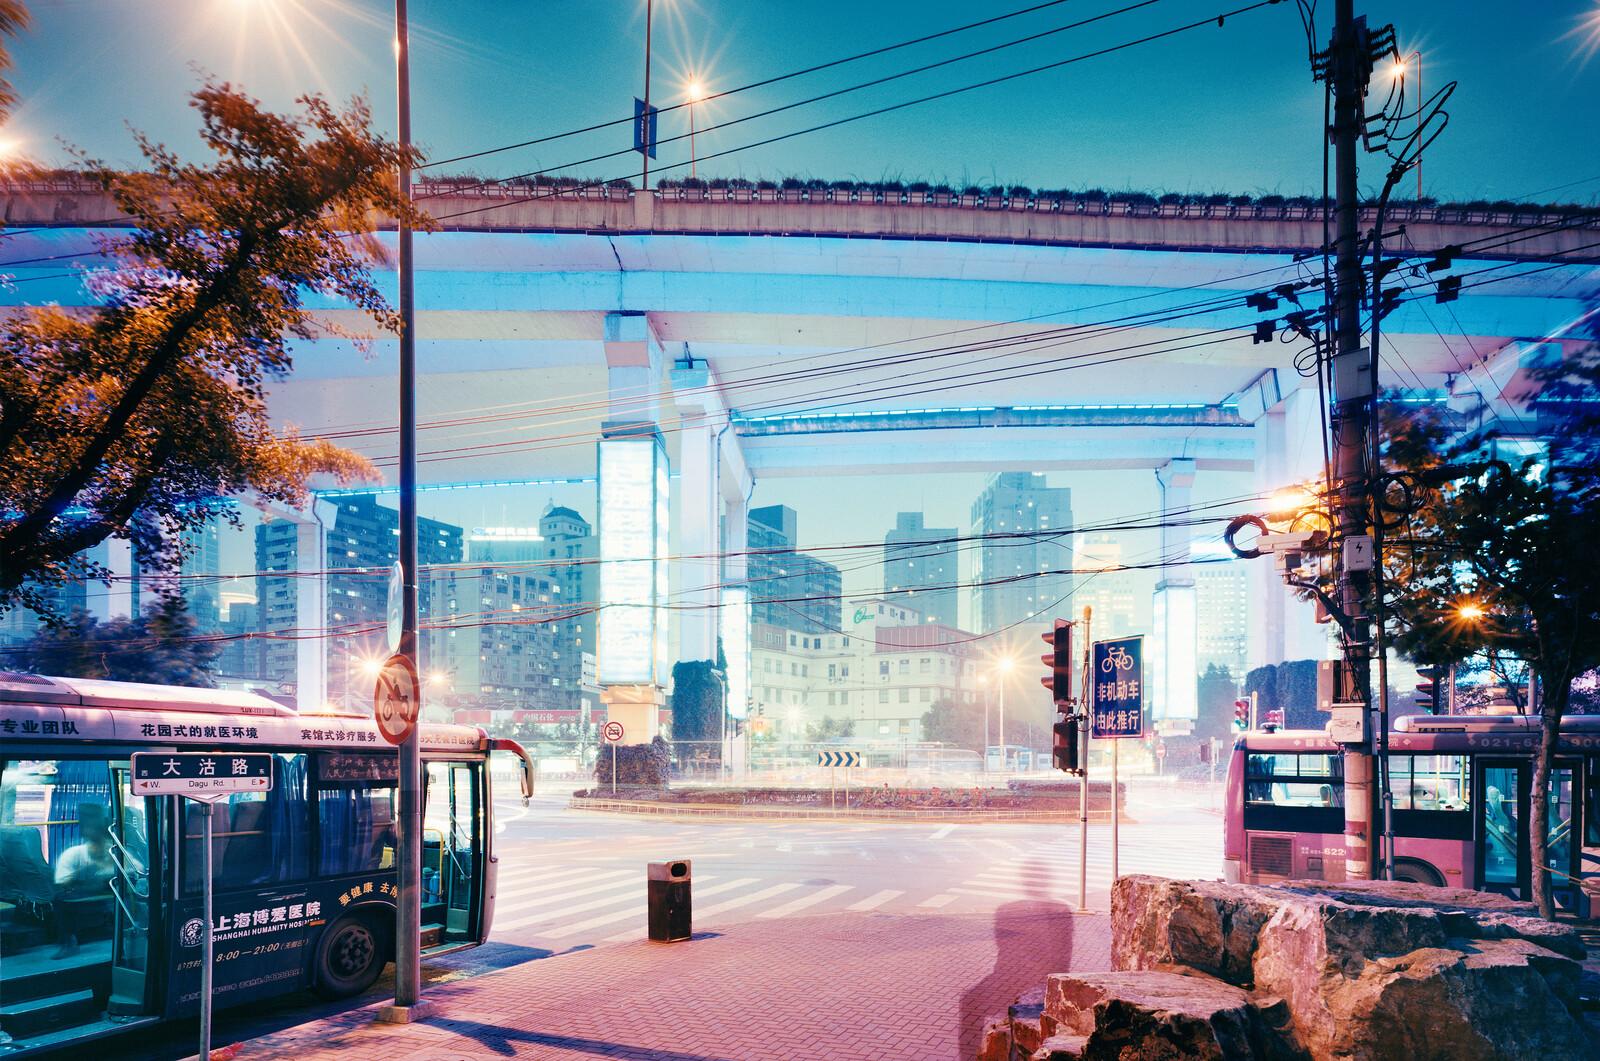 Elevated Expressway Dagu Lu/Chengdu Lu - Horst & Daniel  Zielske